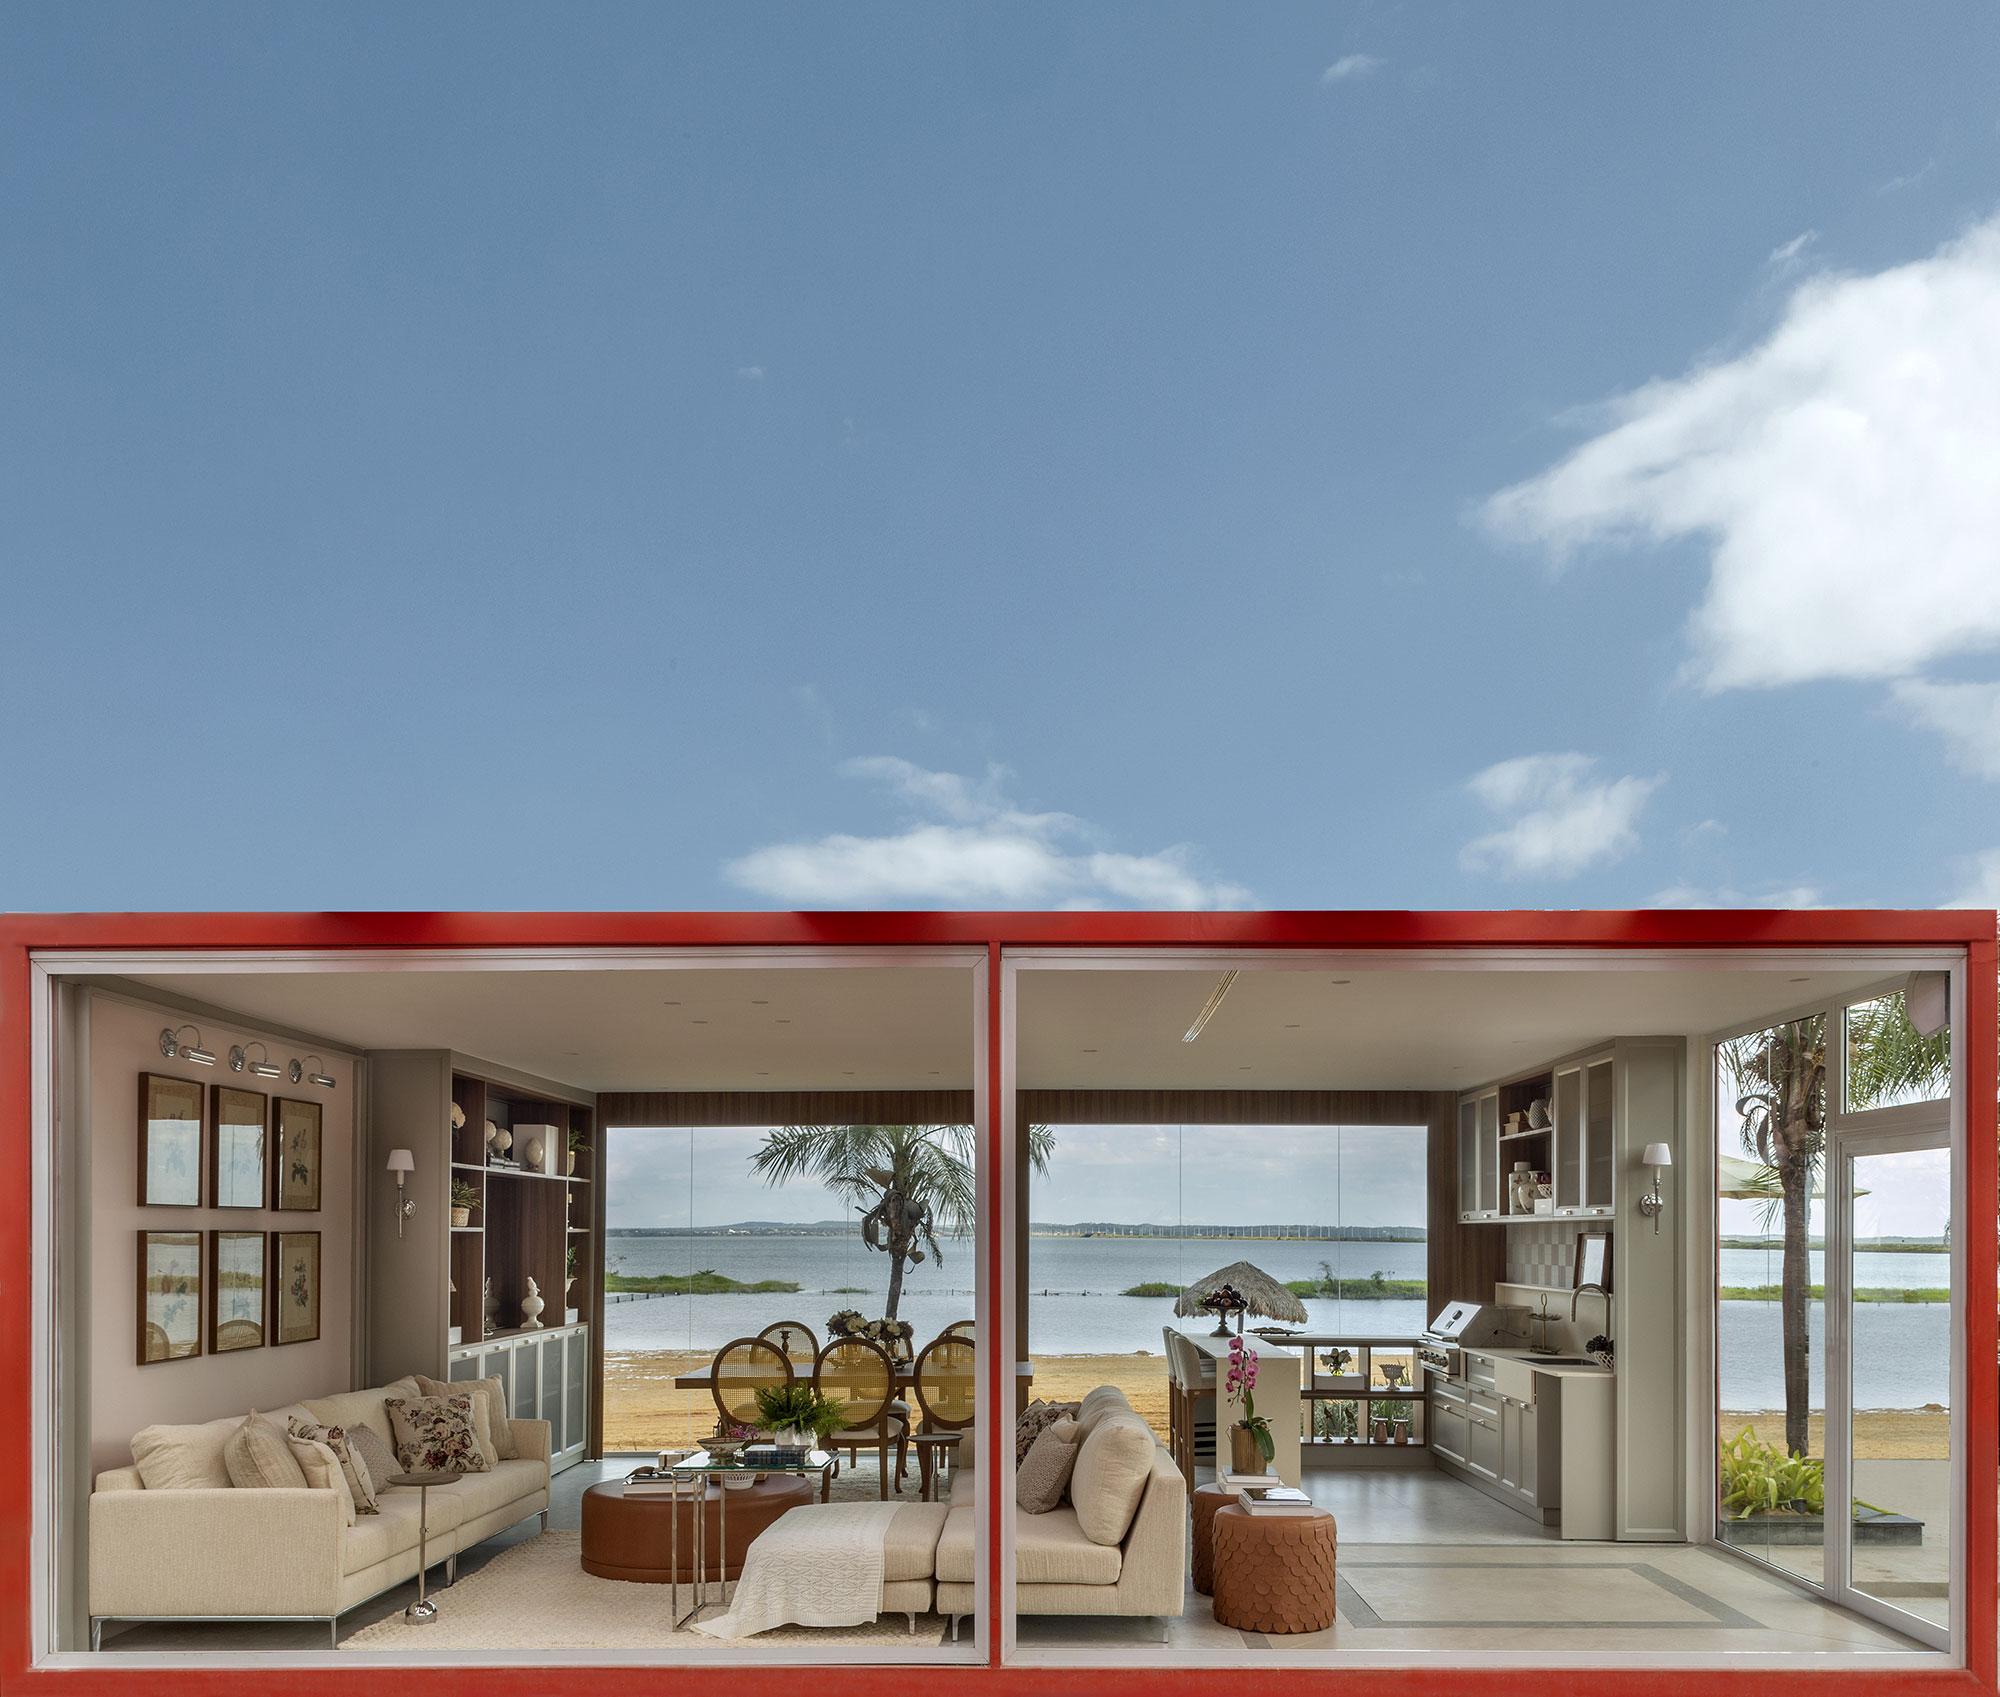 janelas casacor tocantins 2021 foto edgard cesar varanda-urban-erika-abdalla